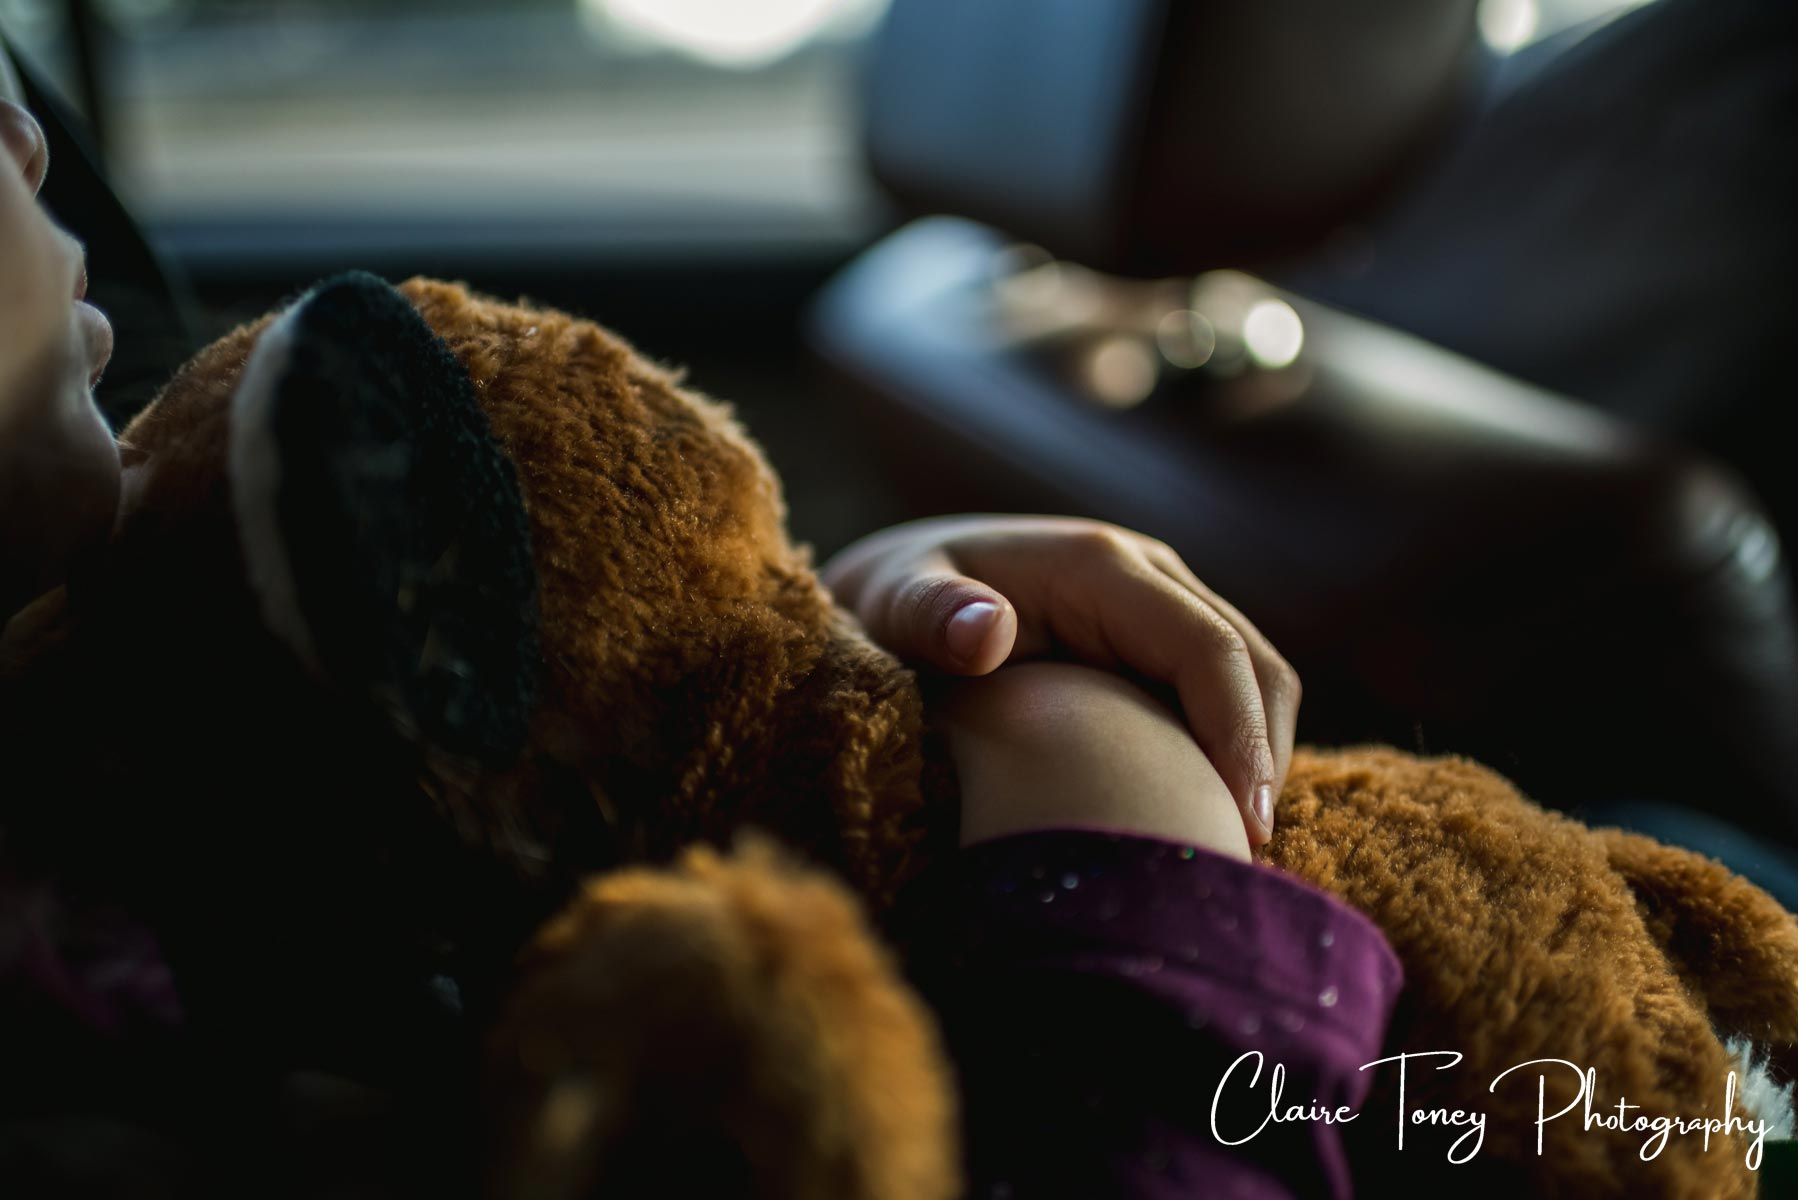 sleeping girl holding her stuffed animal on the way home